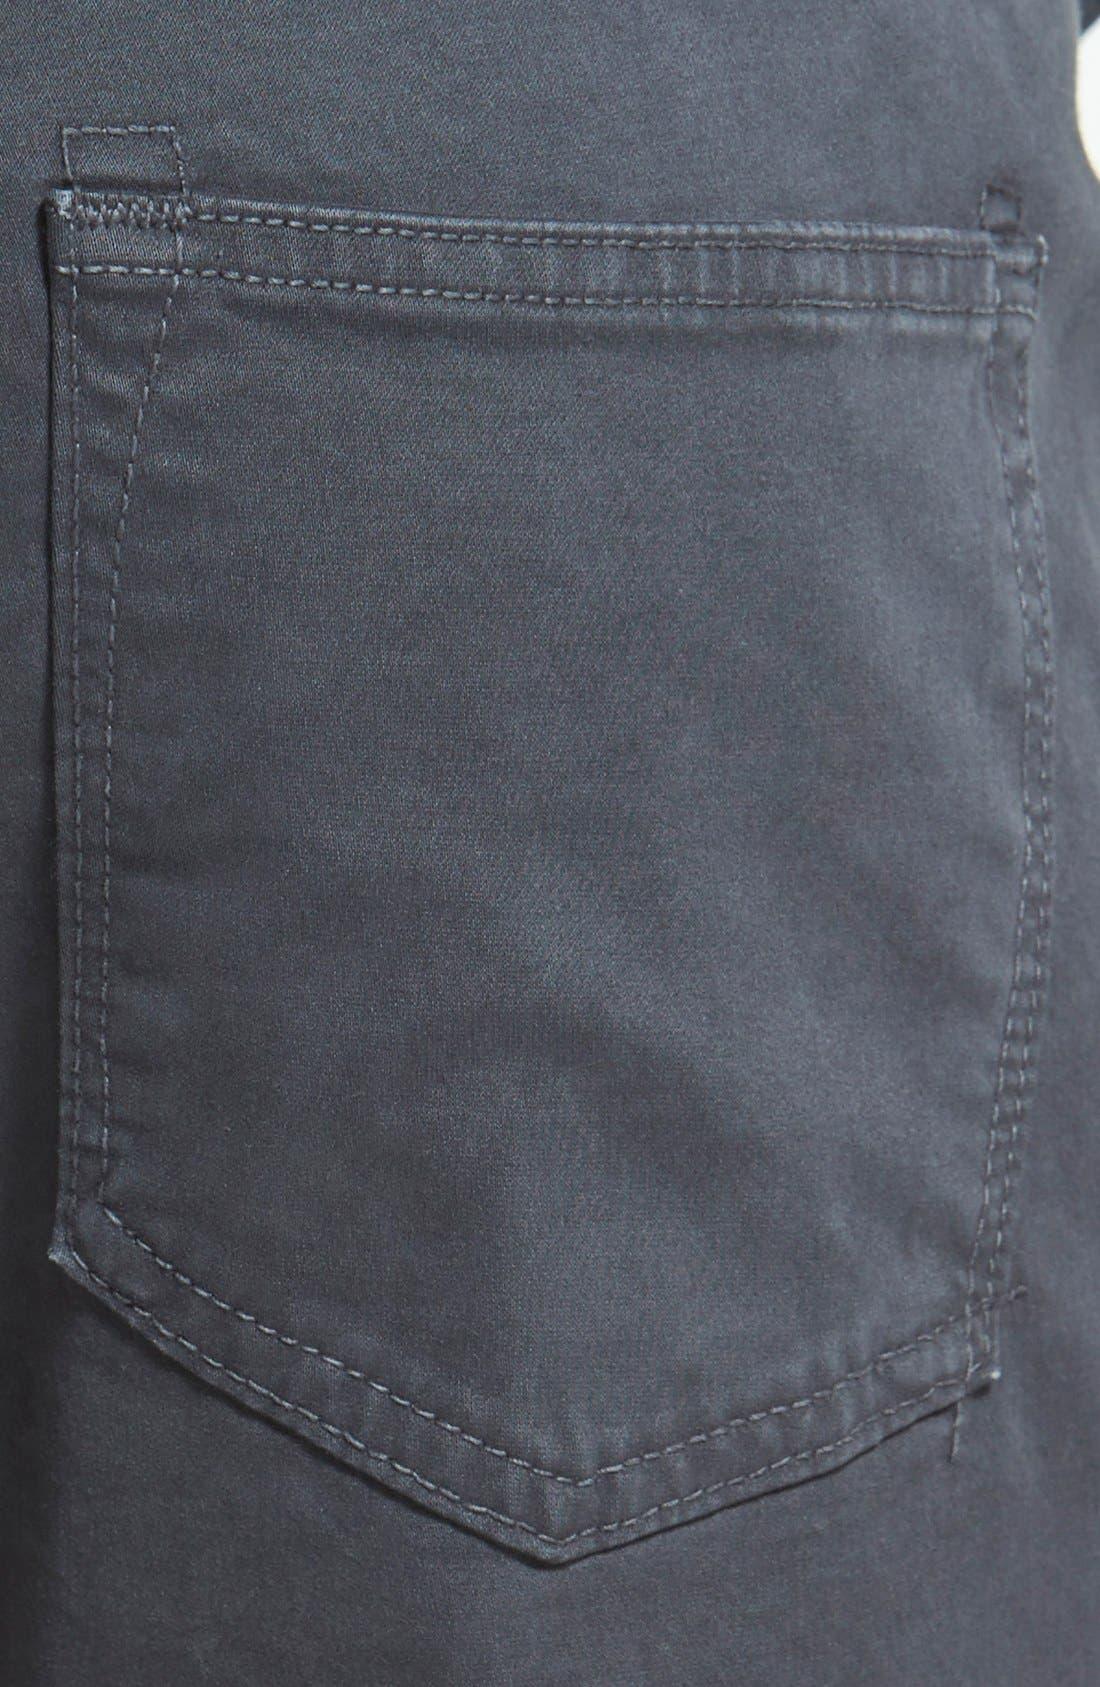 'Kane' Slim Fit Cotton Twill Pants,                             Alternate thumbnail 74, color,